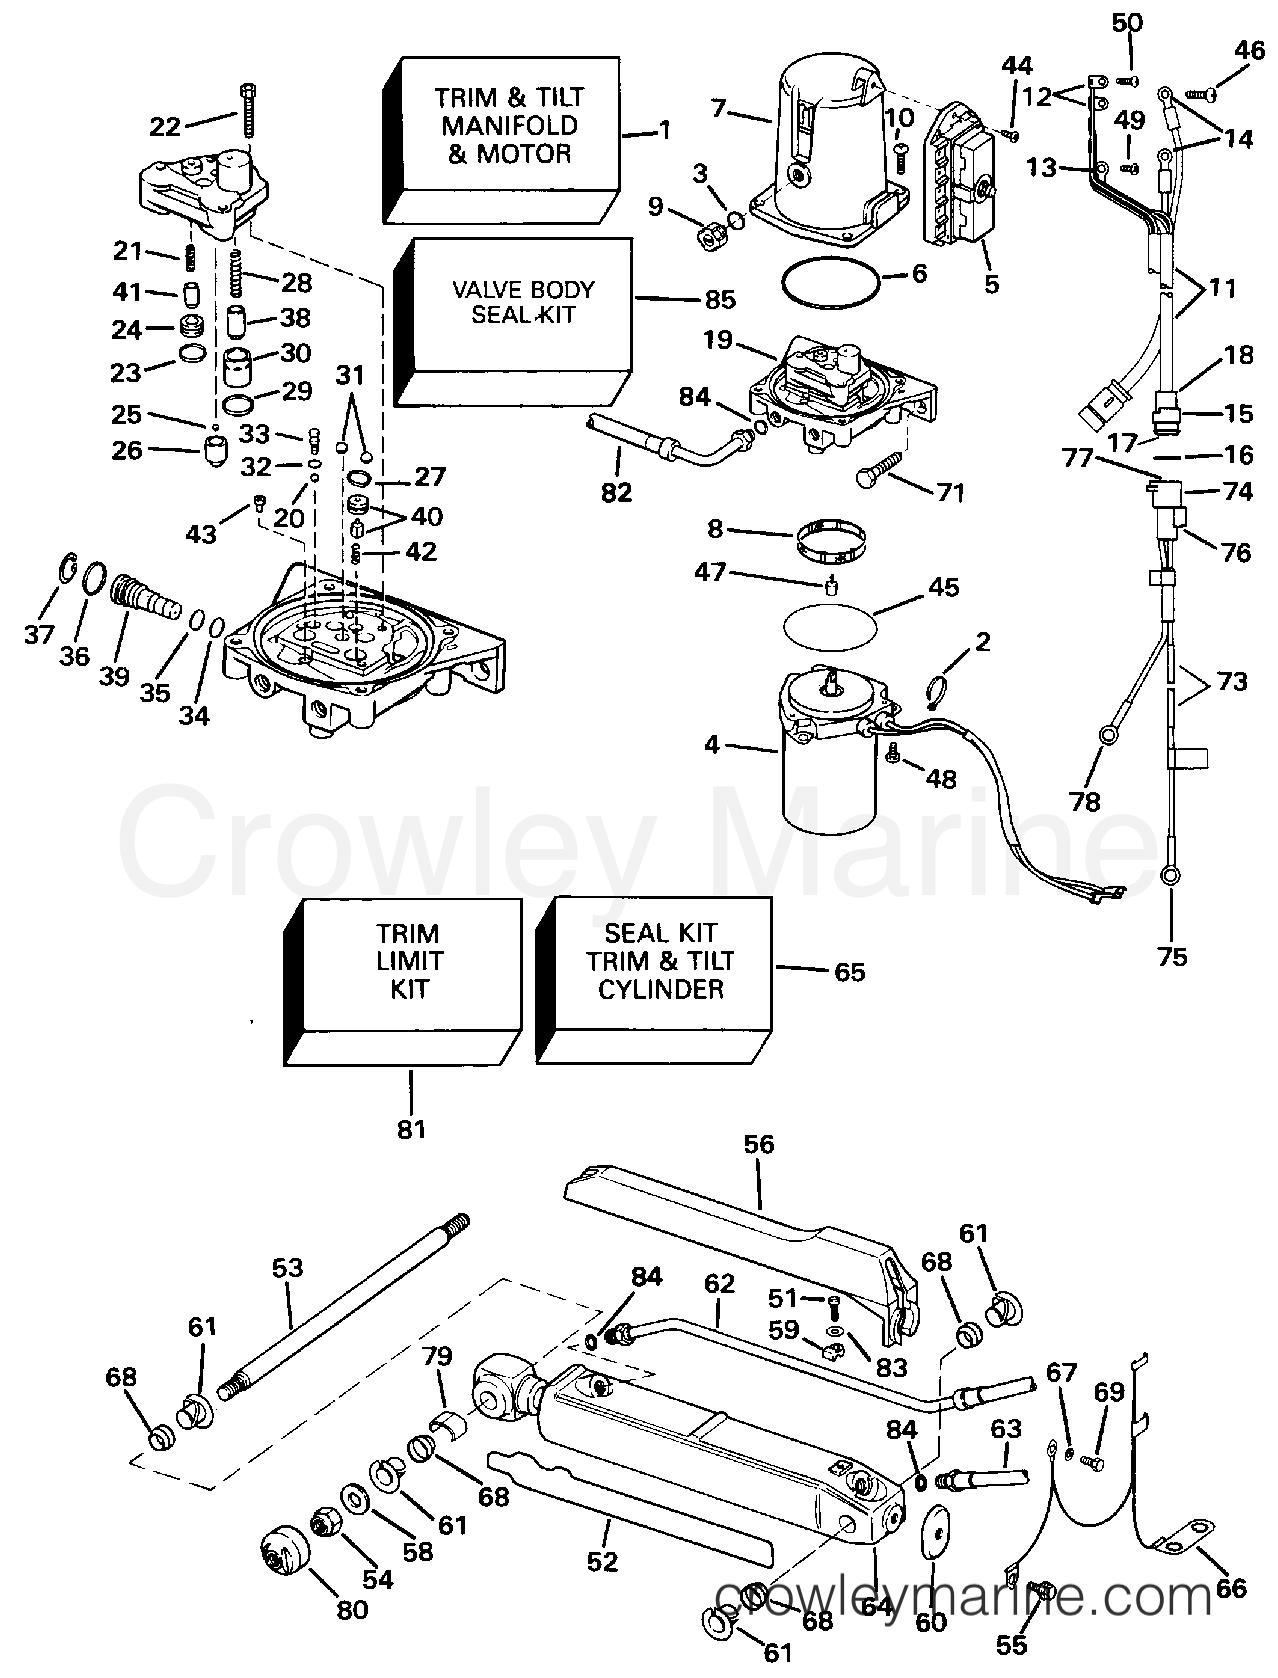 1994 OMC Stern Drive 7.4 - 744DJPMDA - POWER TRIM AND TILT